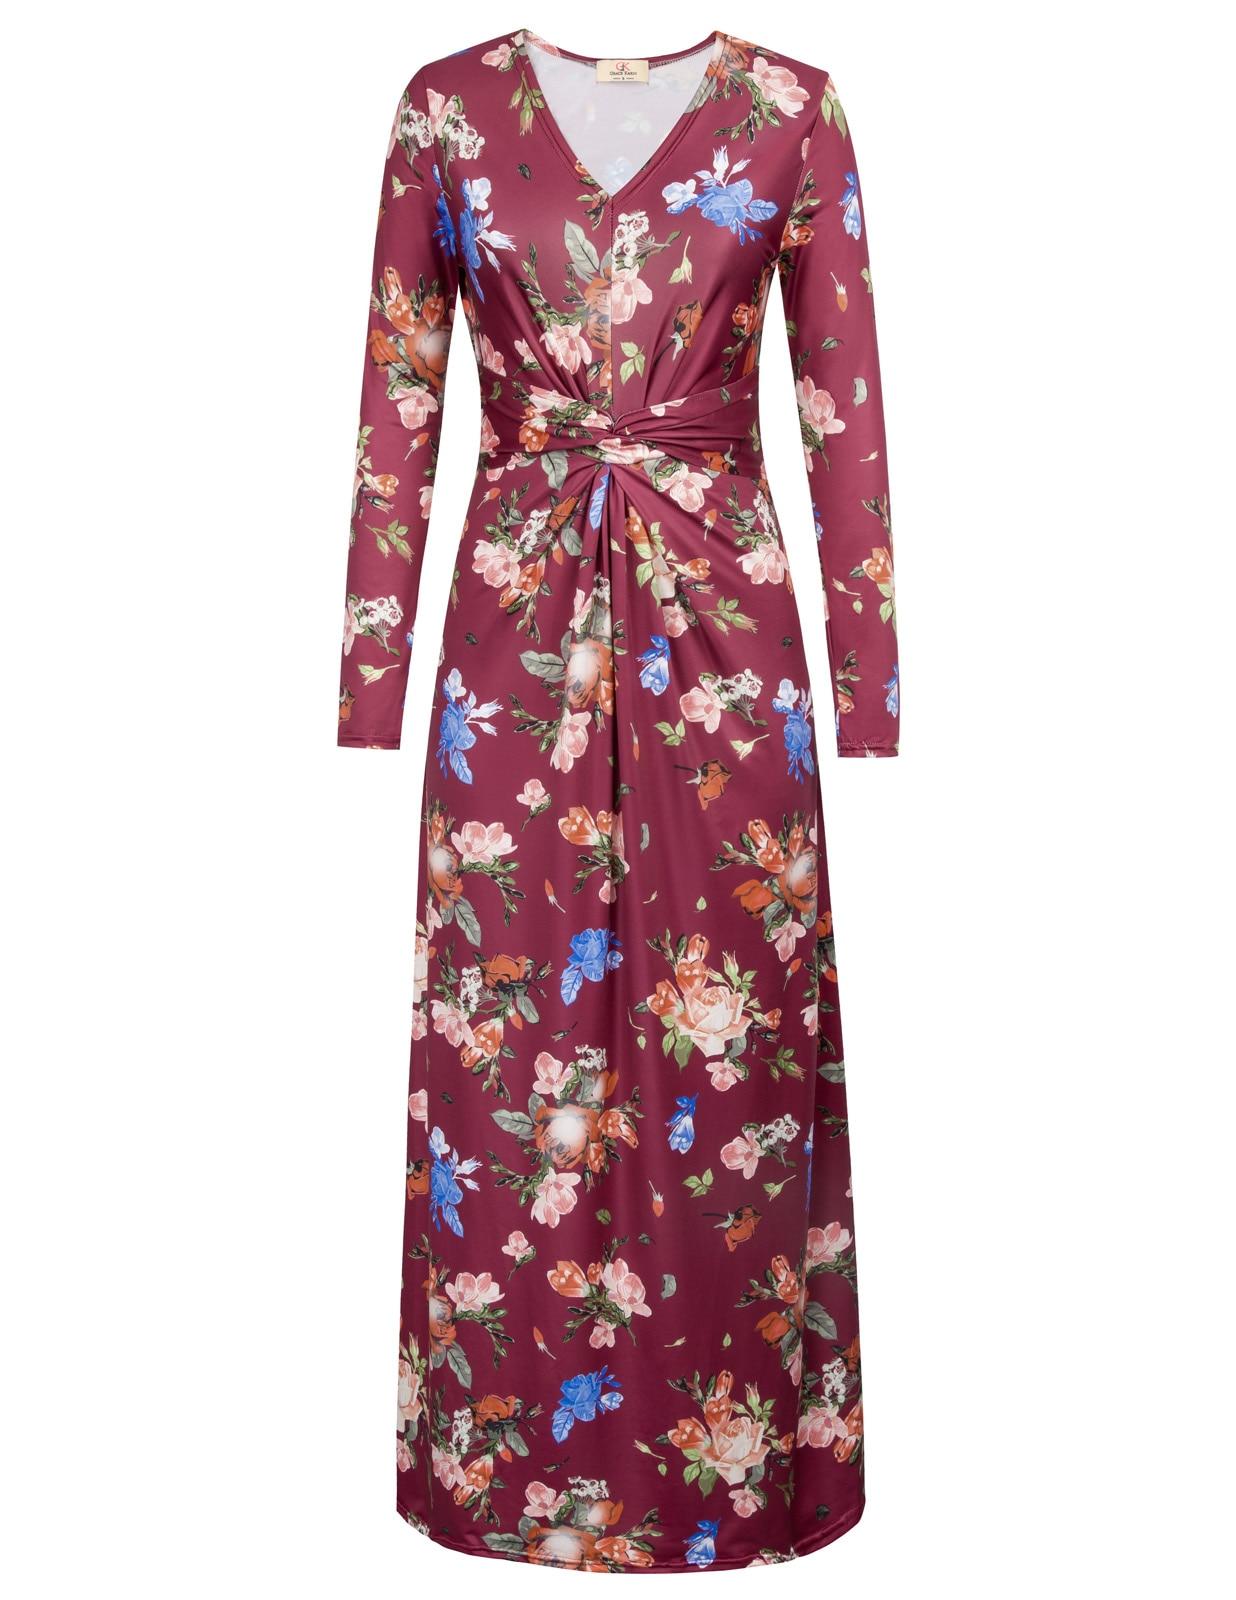 2018 vintage Women dress Floral Pattern Long Sleeve V-Neck Twist & Twirl Maxi A-Line Dress vestidos largos de verano casual